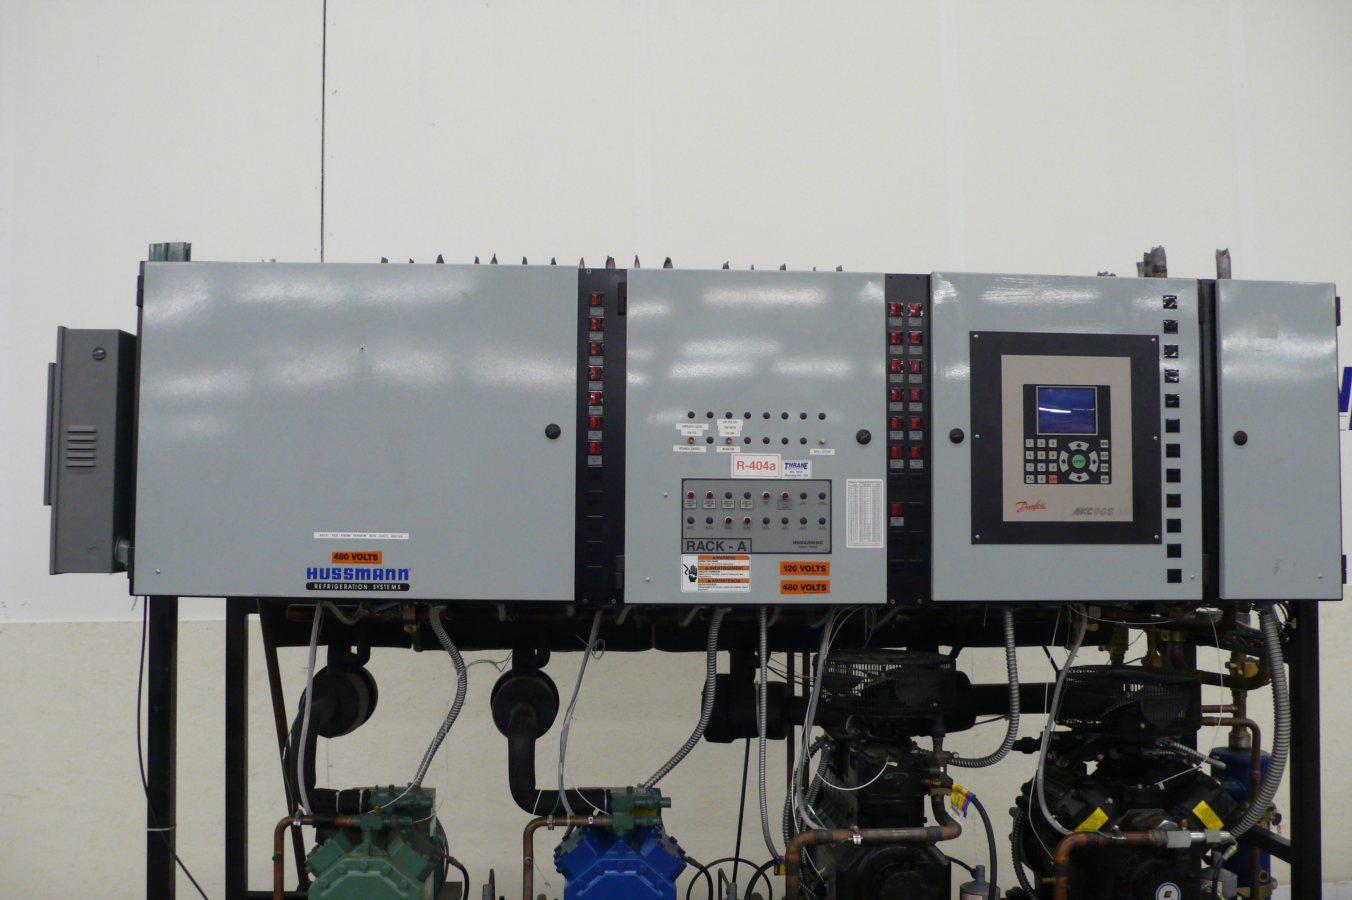 copeland discus wiring diagram comelit hussmann 30 hp low temp freezer refrigeration rack